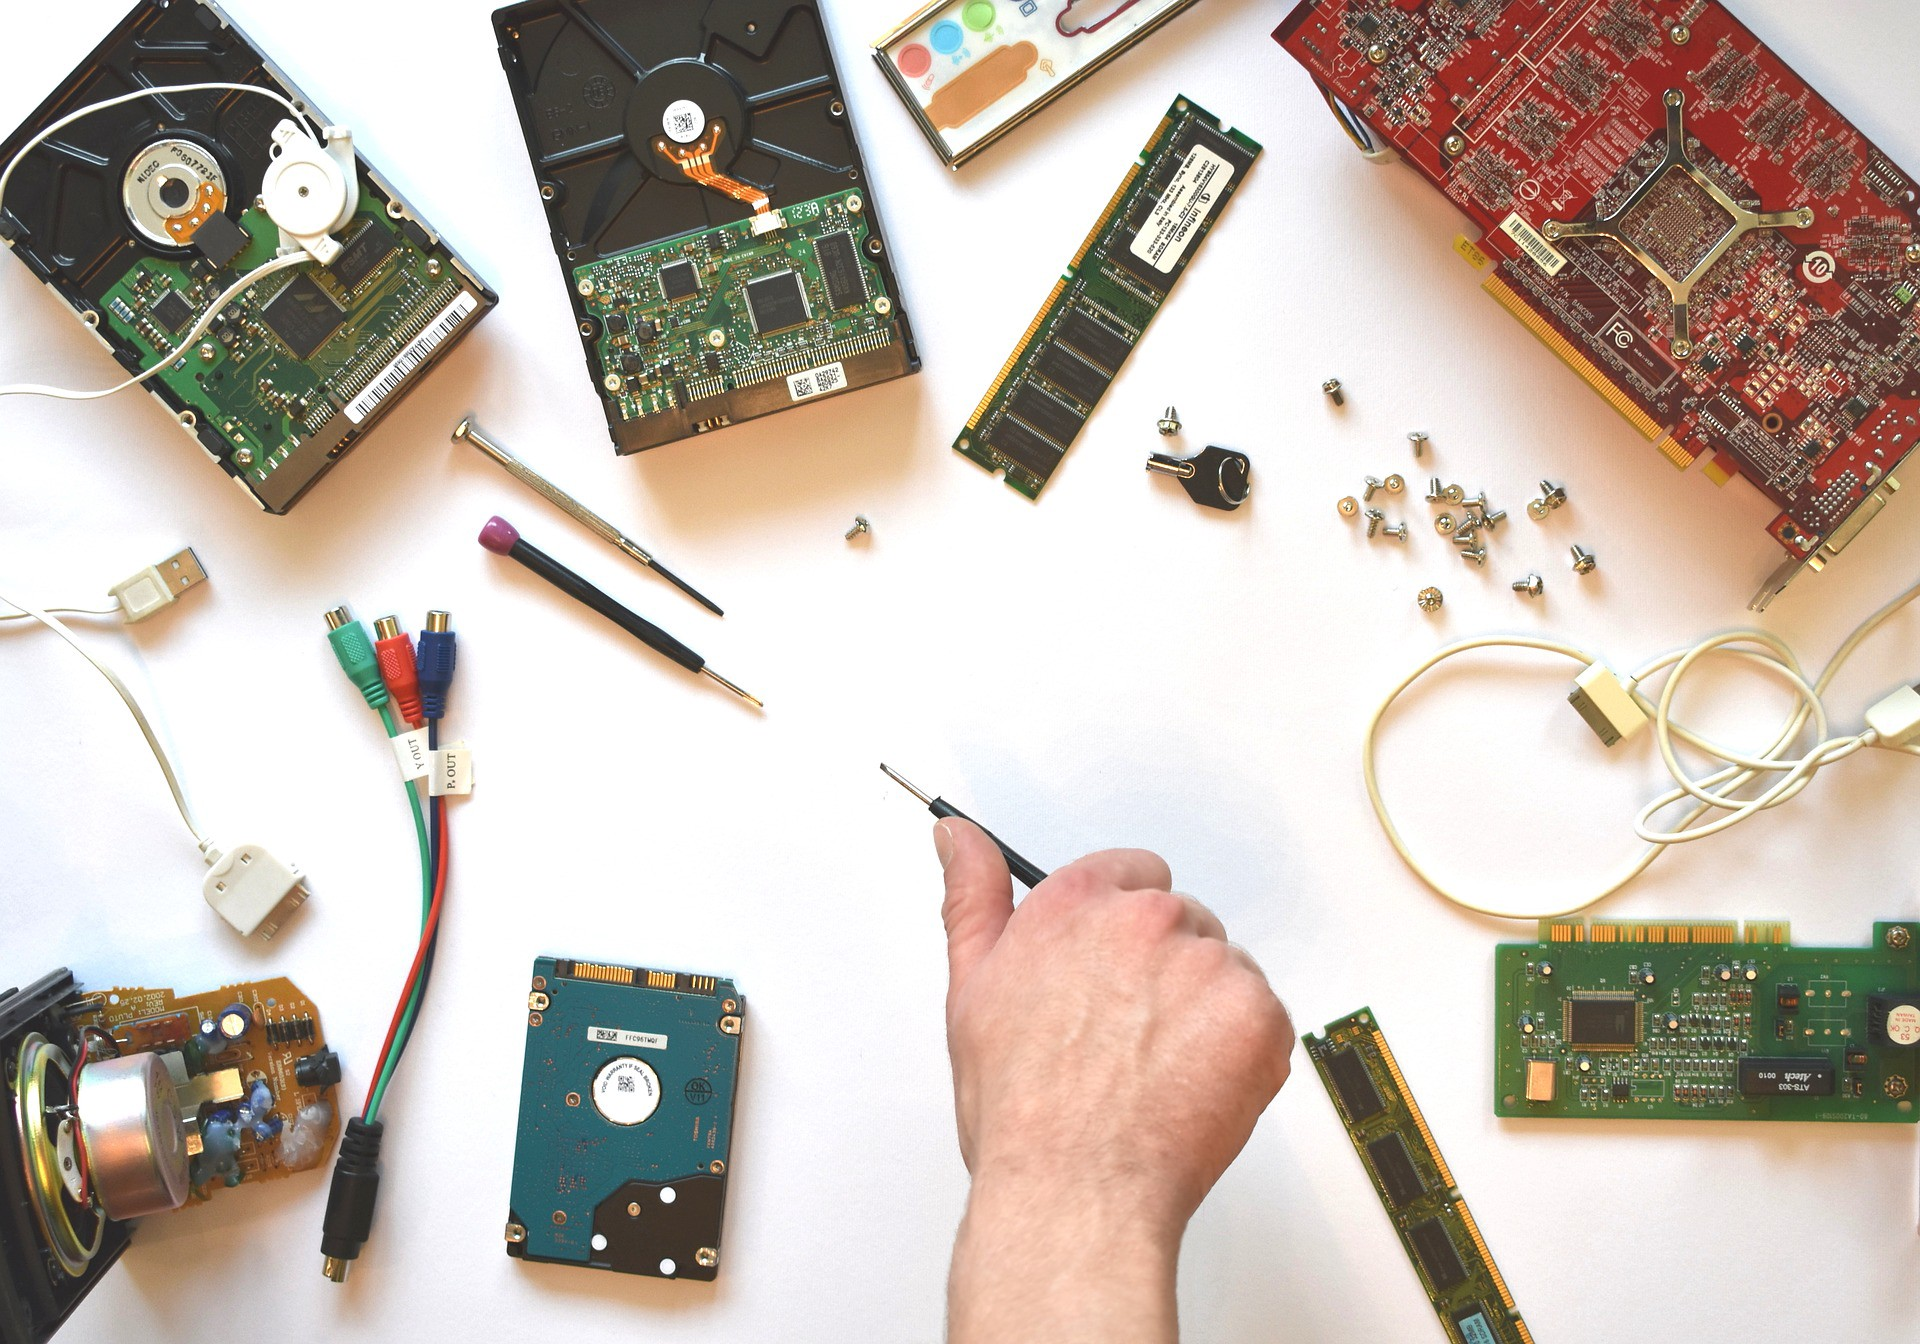 Appliance Repair Needs, Shops and Warranties